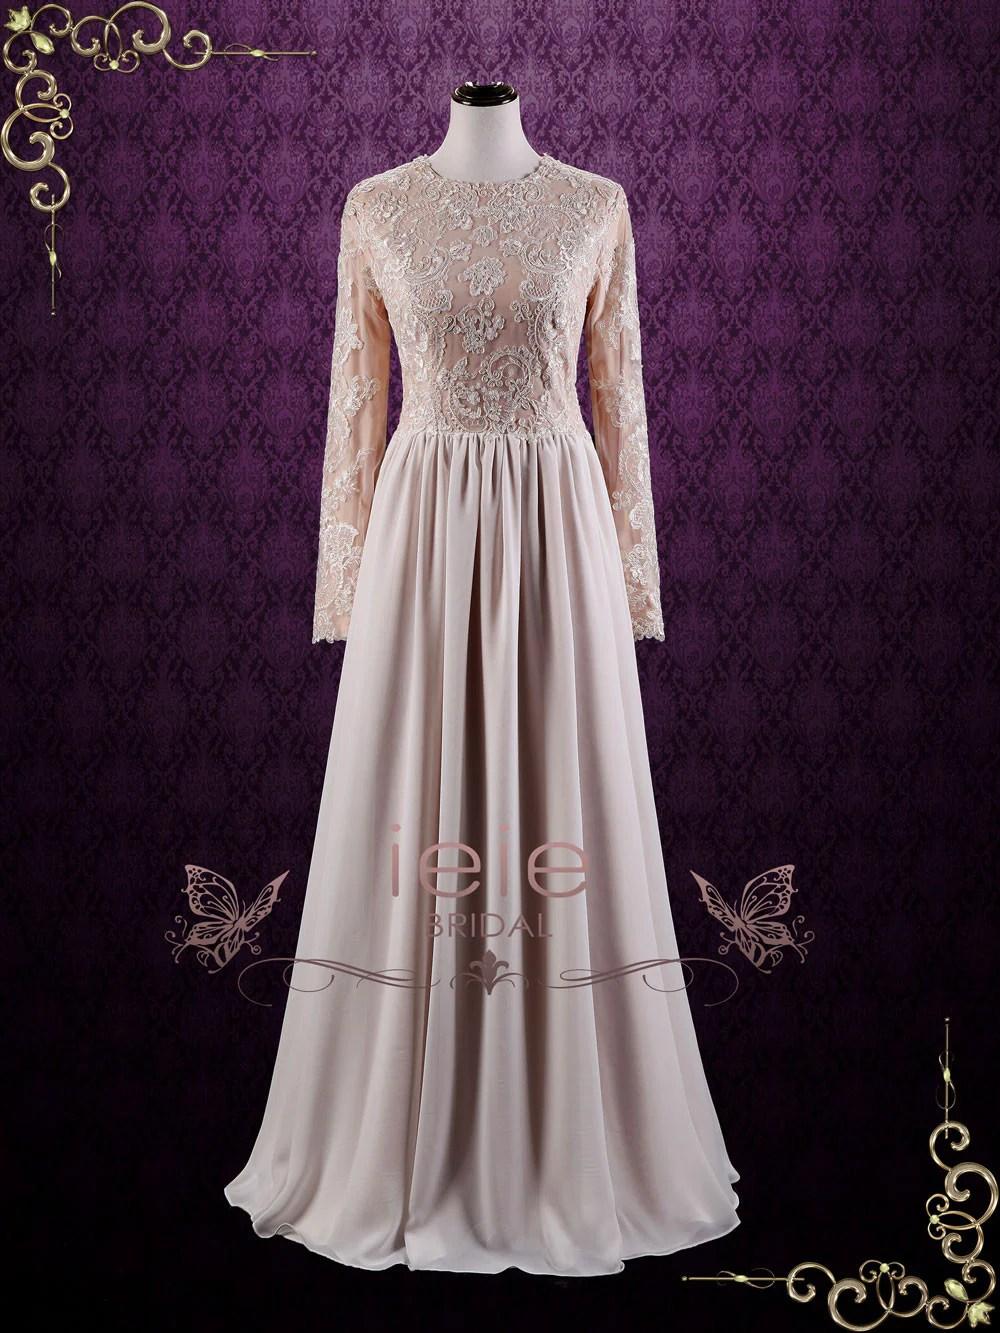 modest plus size wedding dresses modest wedding dresses Plus Size Modest Wedding Dresses Dress Ideas